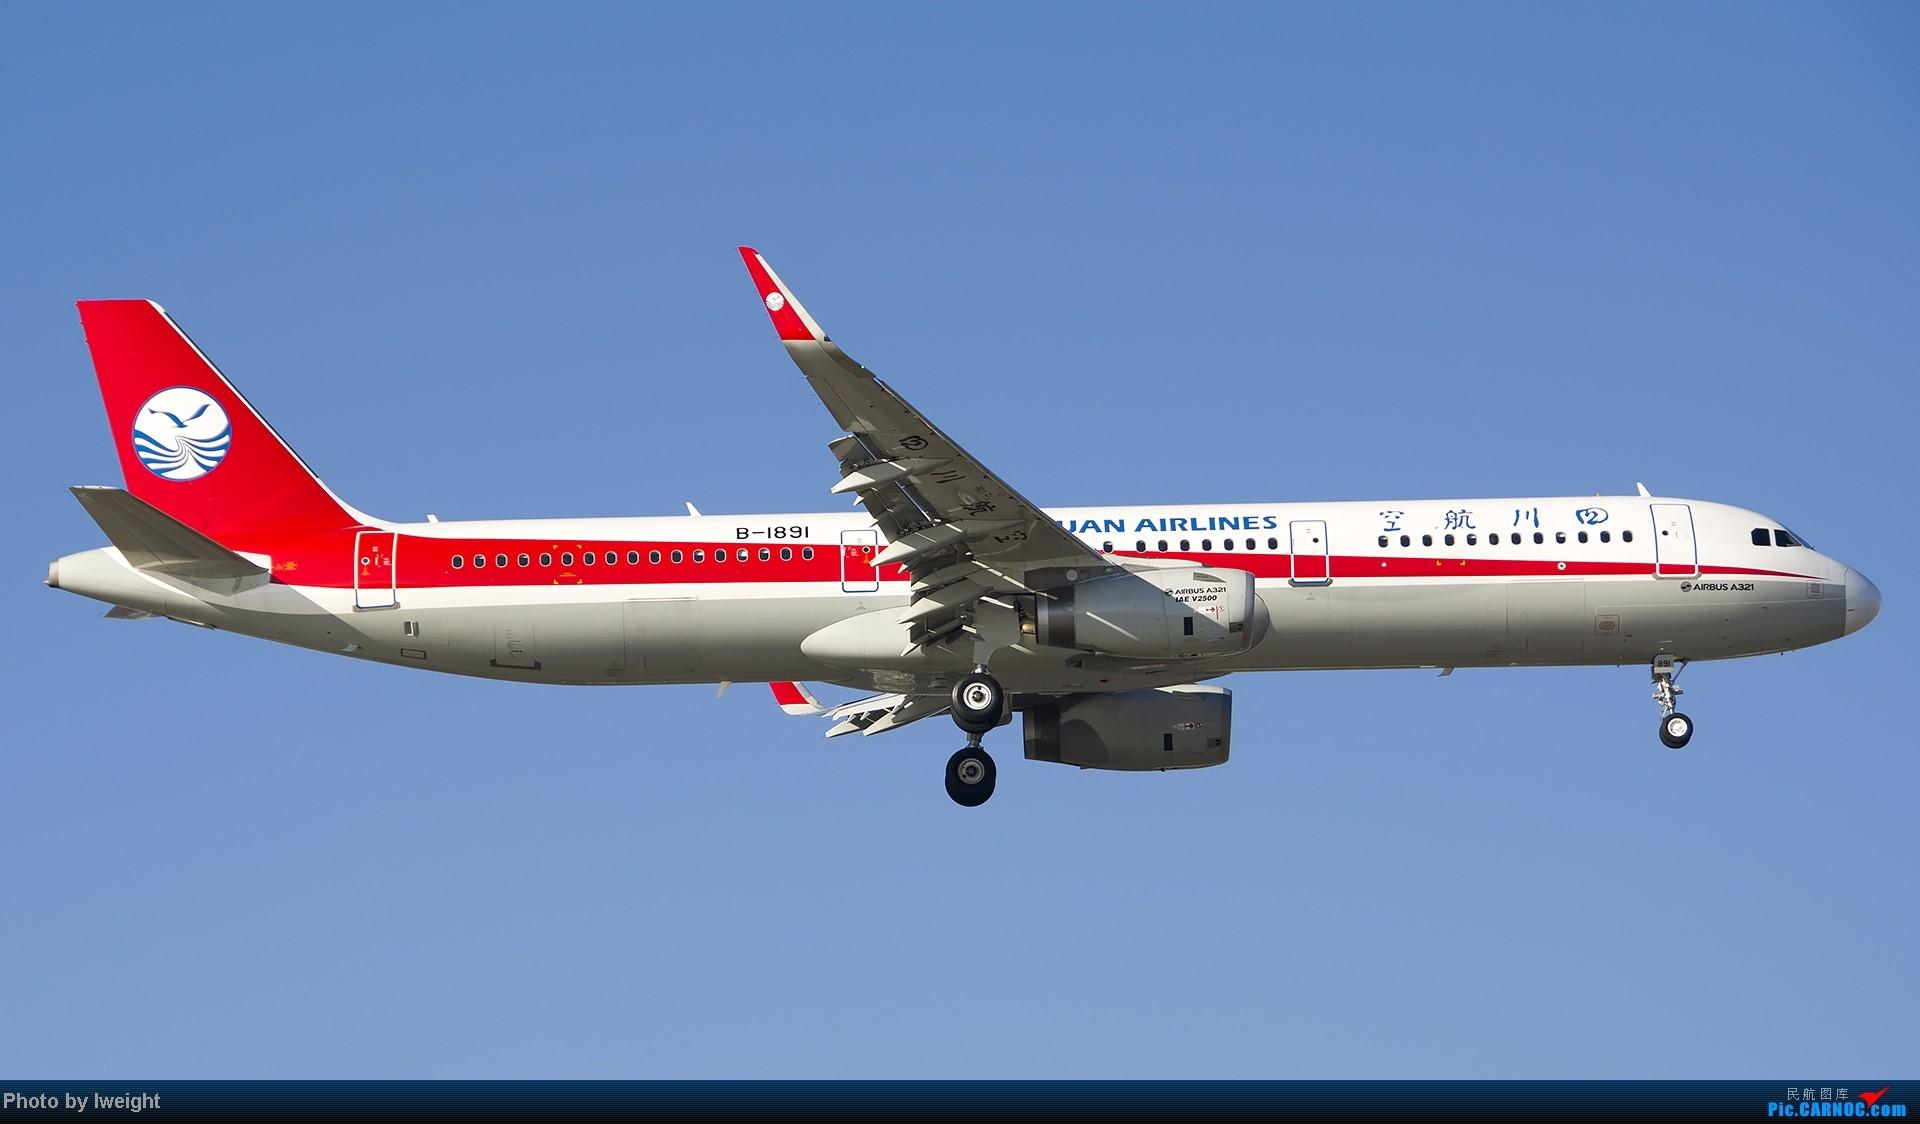 Re:[原创]抓住APEC蓝的尾巴,再拍上一组 AIRBUS A321-200 B-1891 中国北京首都机场